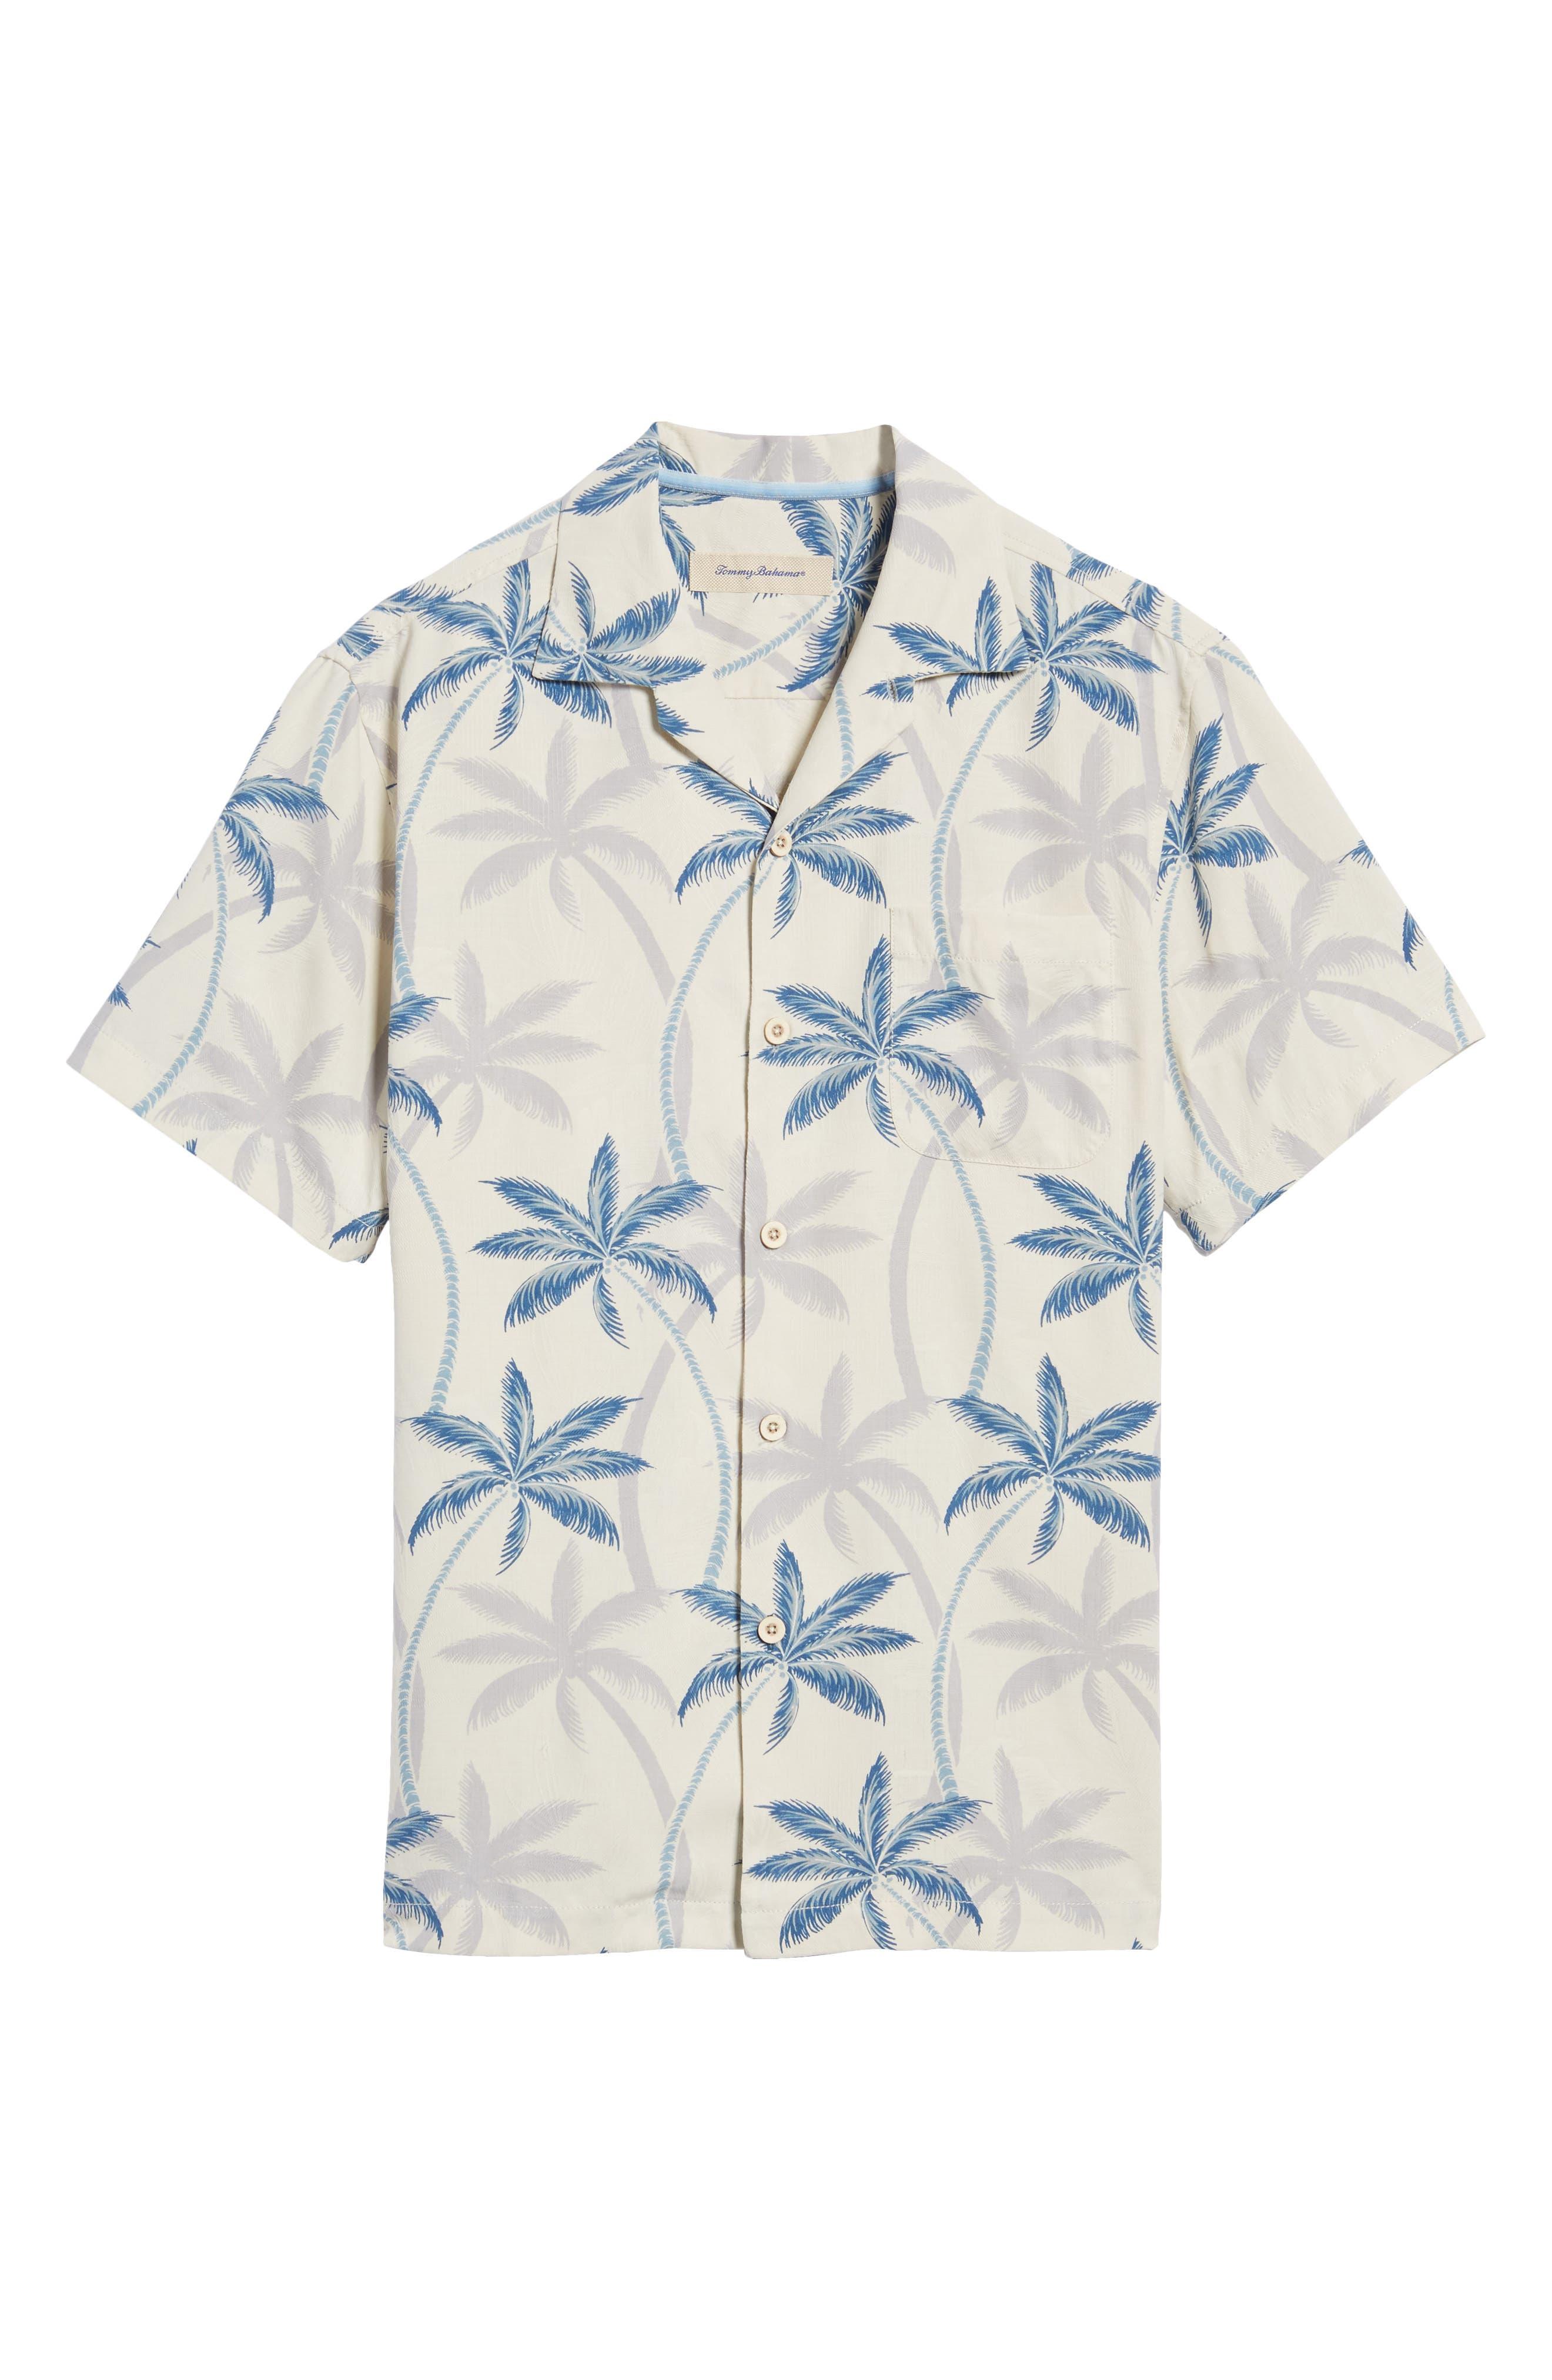 Palmas Palooza Woven Shirt,                             Alternate thumbnail 6, color,                             100